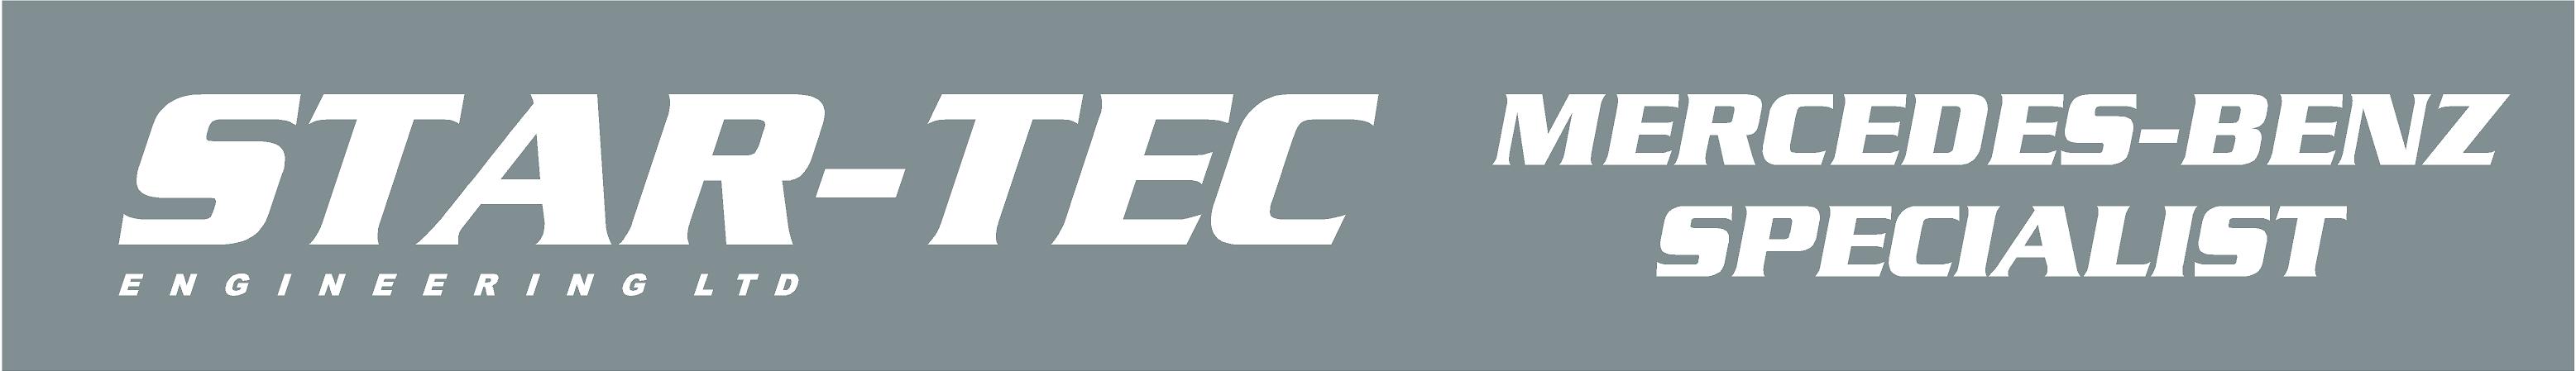 Mercedes Specialist – Star-Tec Engineering Ltd